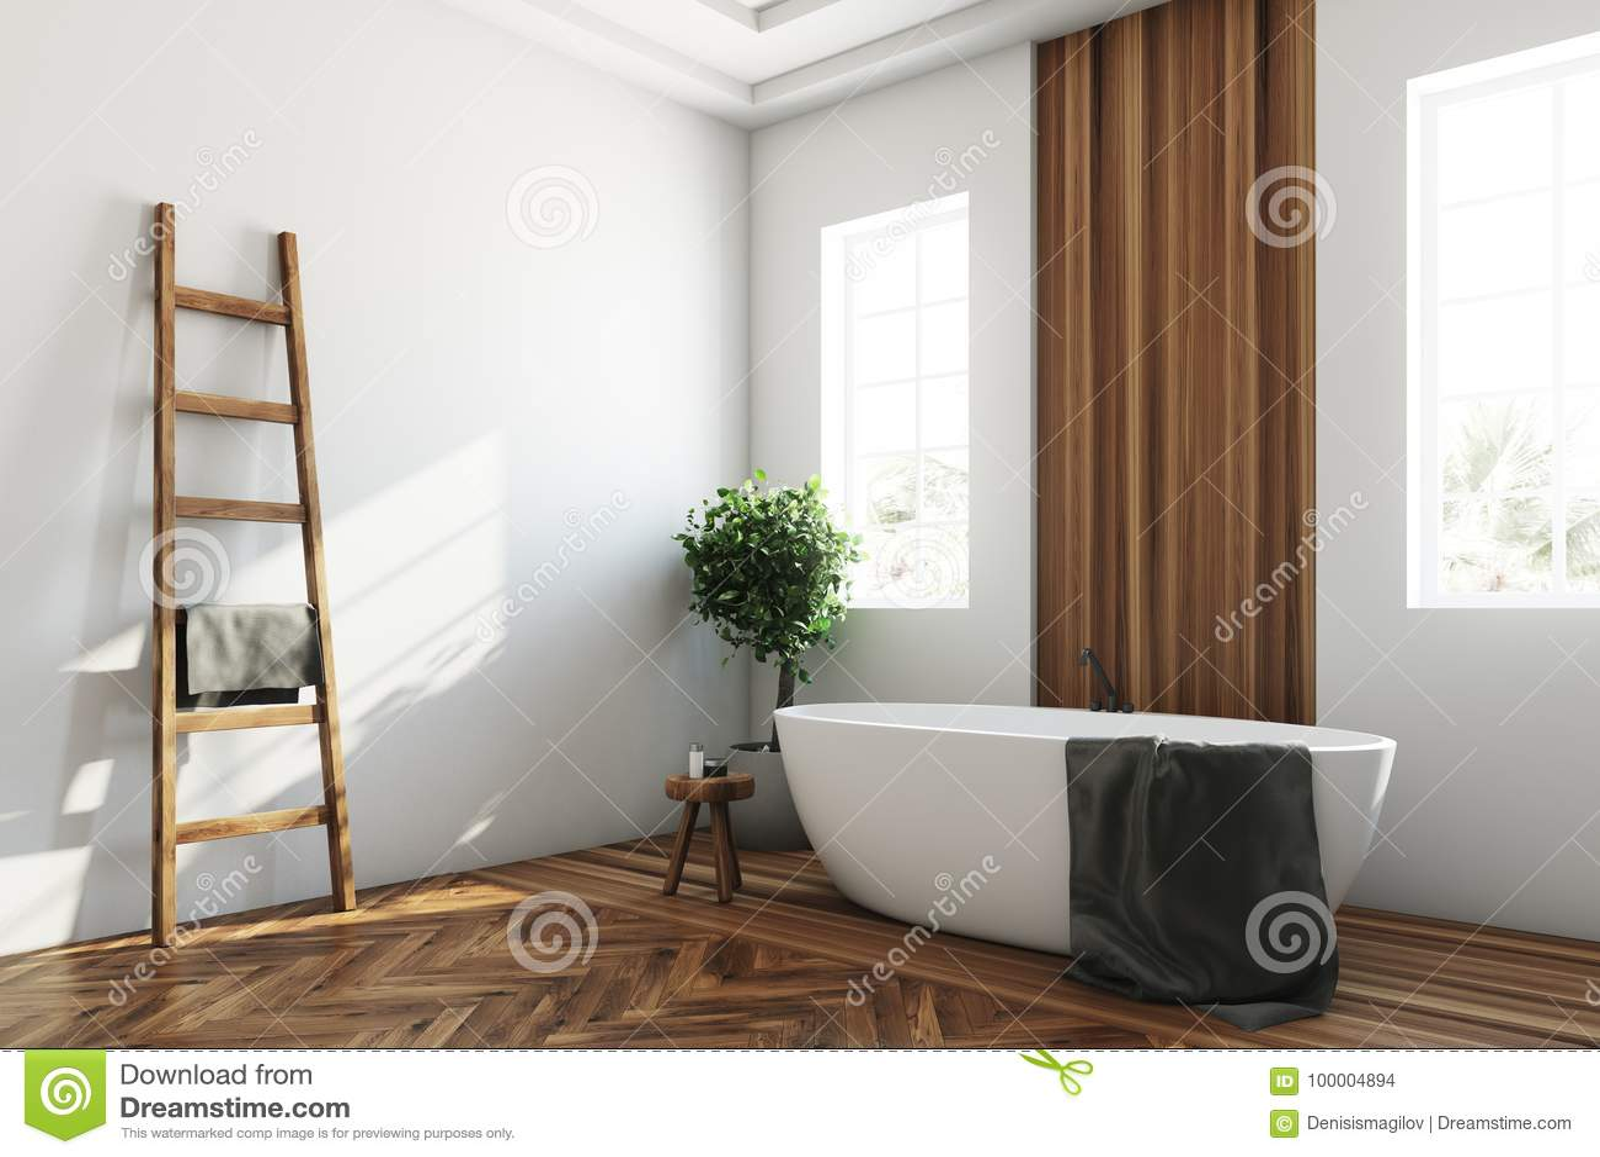 White And Wooden Bathroom, White Tub Corner Stock Illustration ...